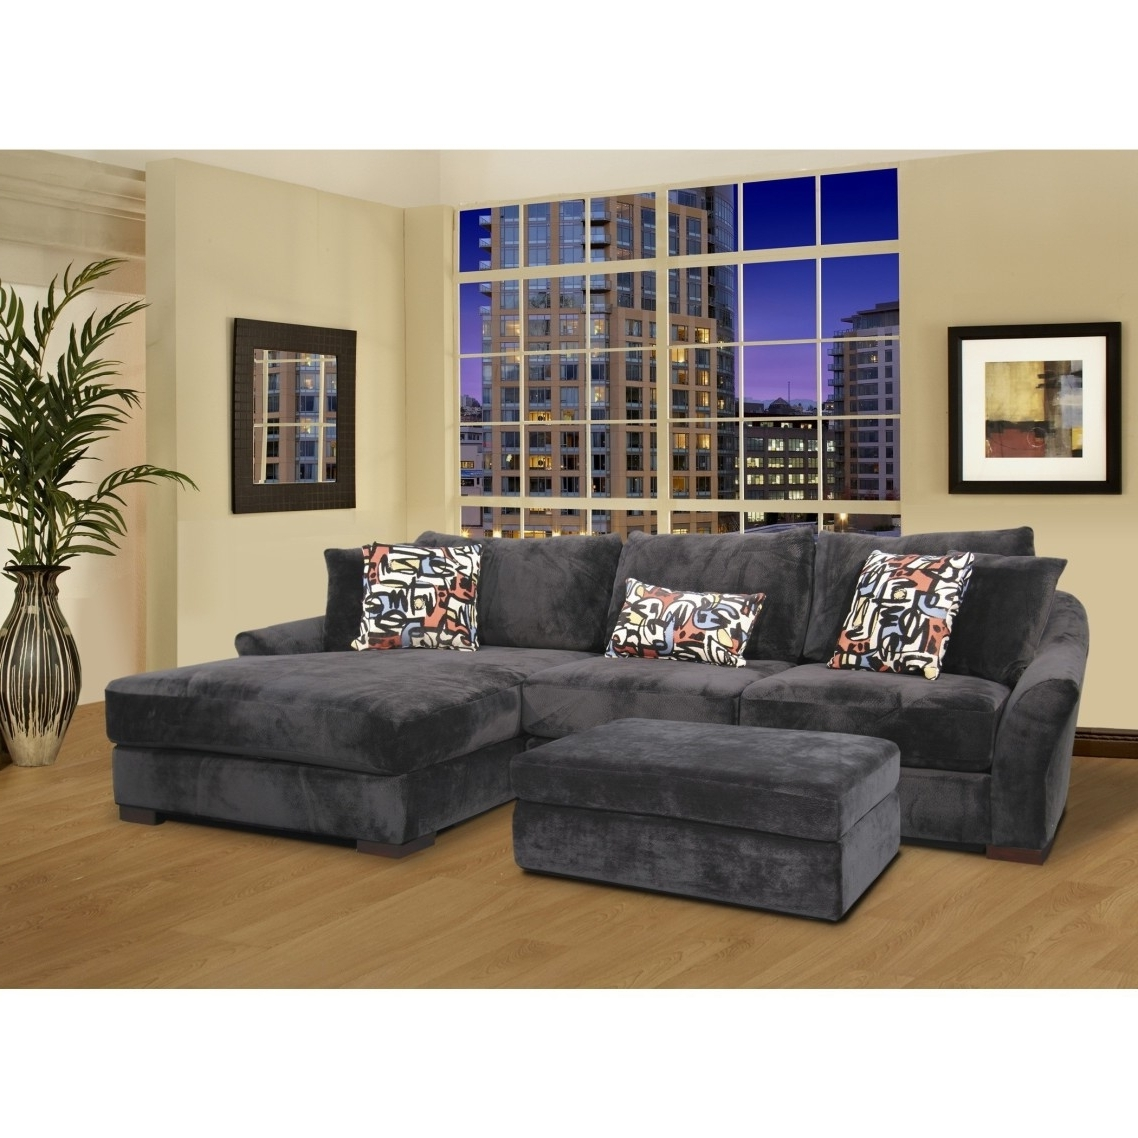 Latest Gray Velvet Oversized Sectional Sleeper Sofa With Left Chaise Within Velvet Chaise Settees (View 12 of 15)